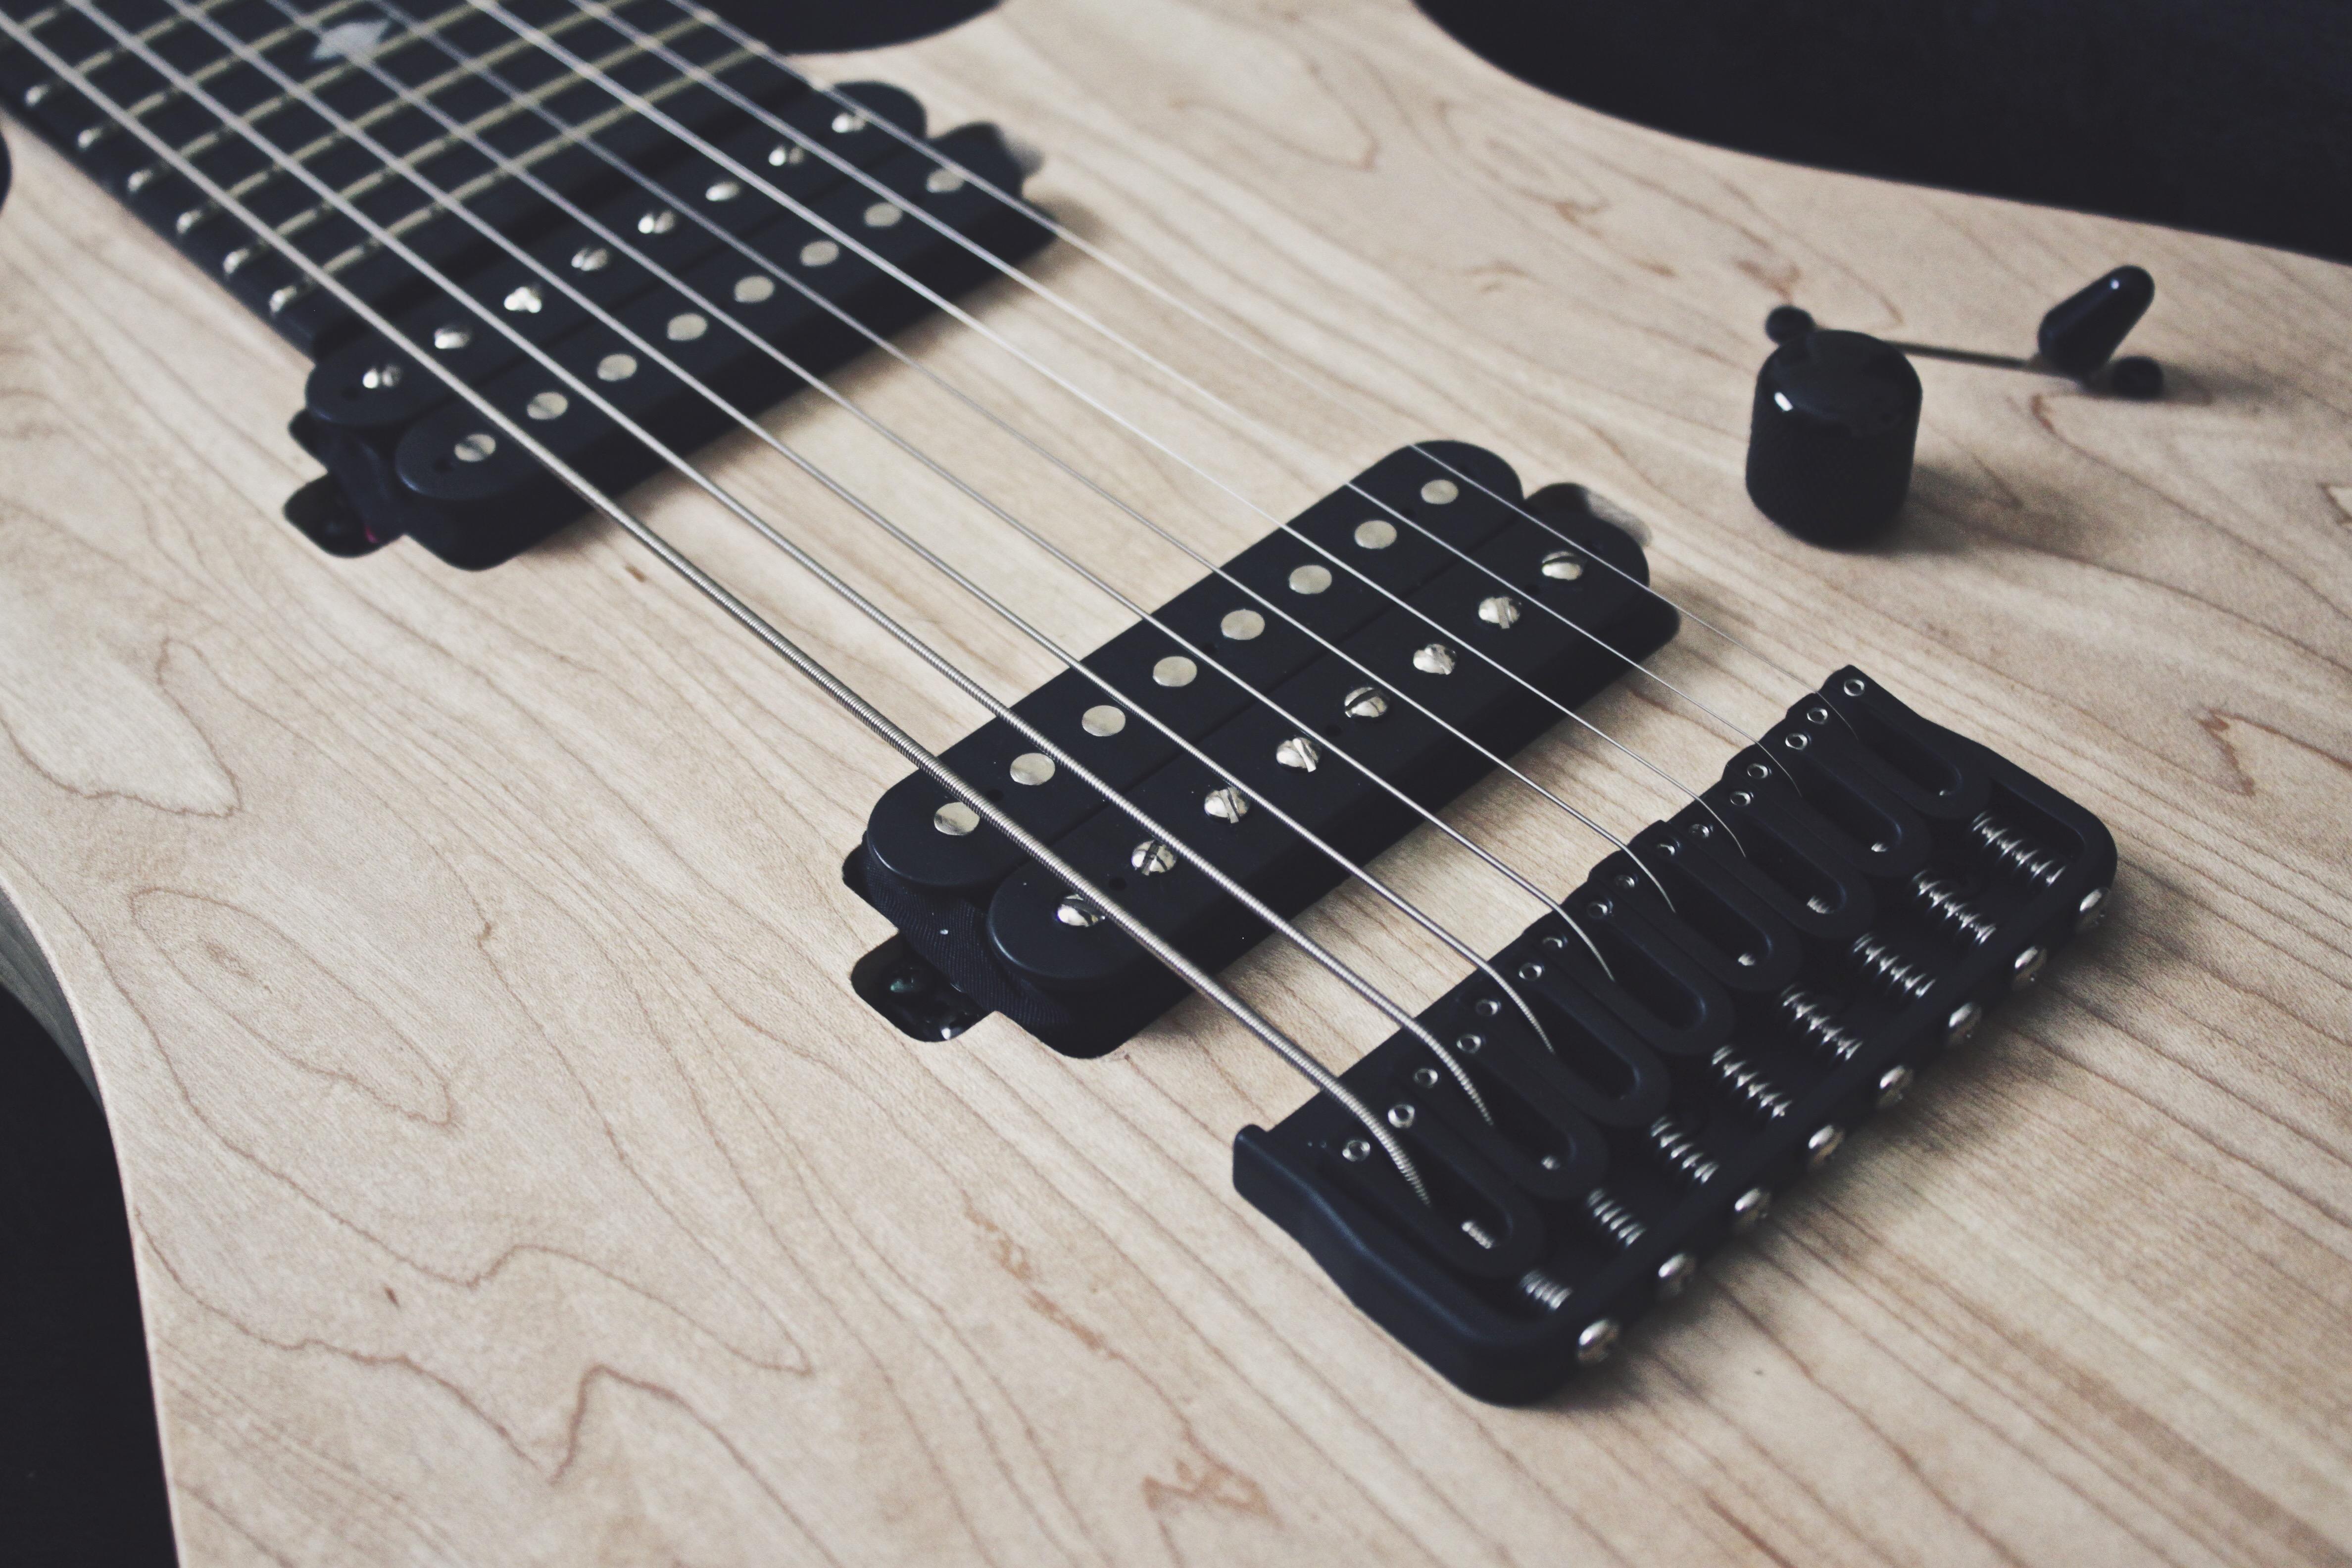 kiesel lithium passive pickups extended range guitar nerds. Black Bedroom Furniture Sets. Home Design Ideas